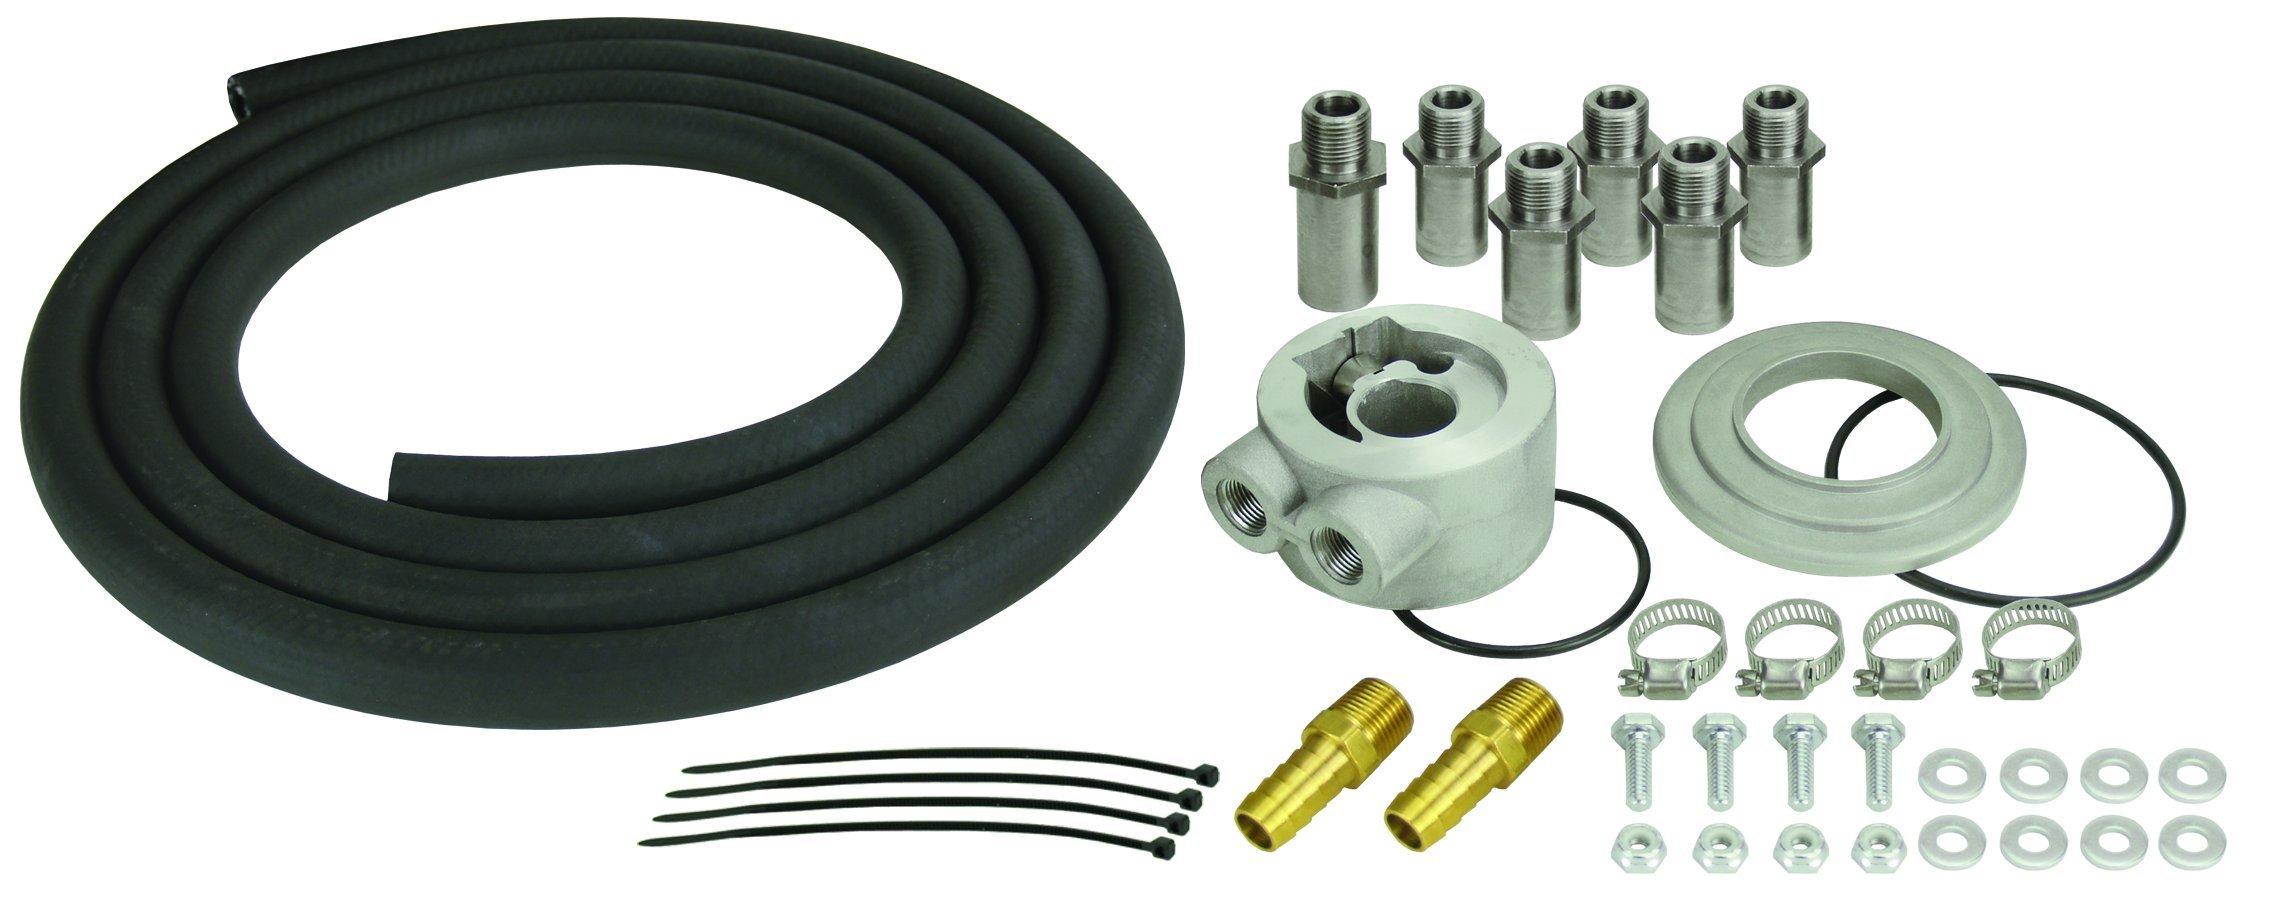 Derale 15751 Engine Remote Oil Cooler Mounting Kit